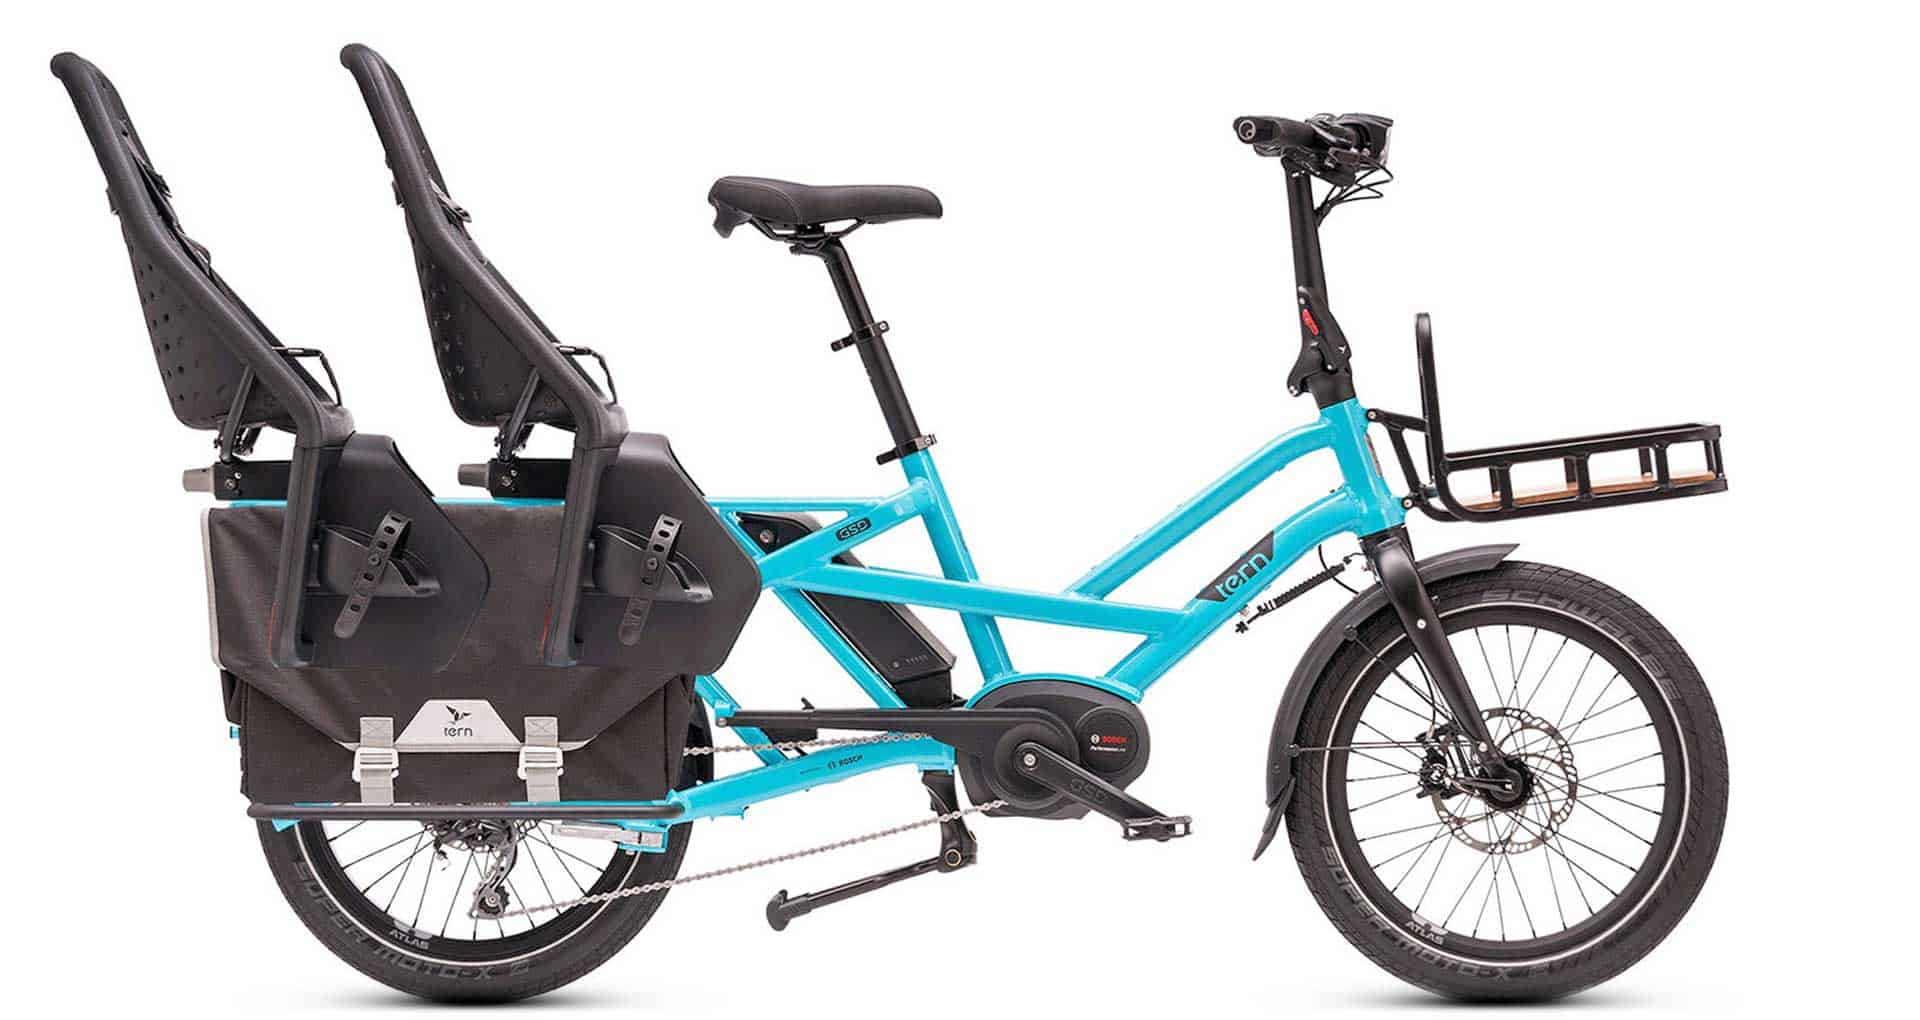 Aksesoris sepeda lipat